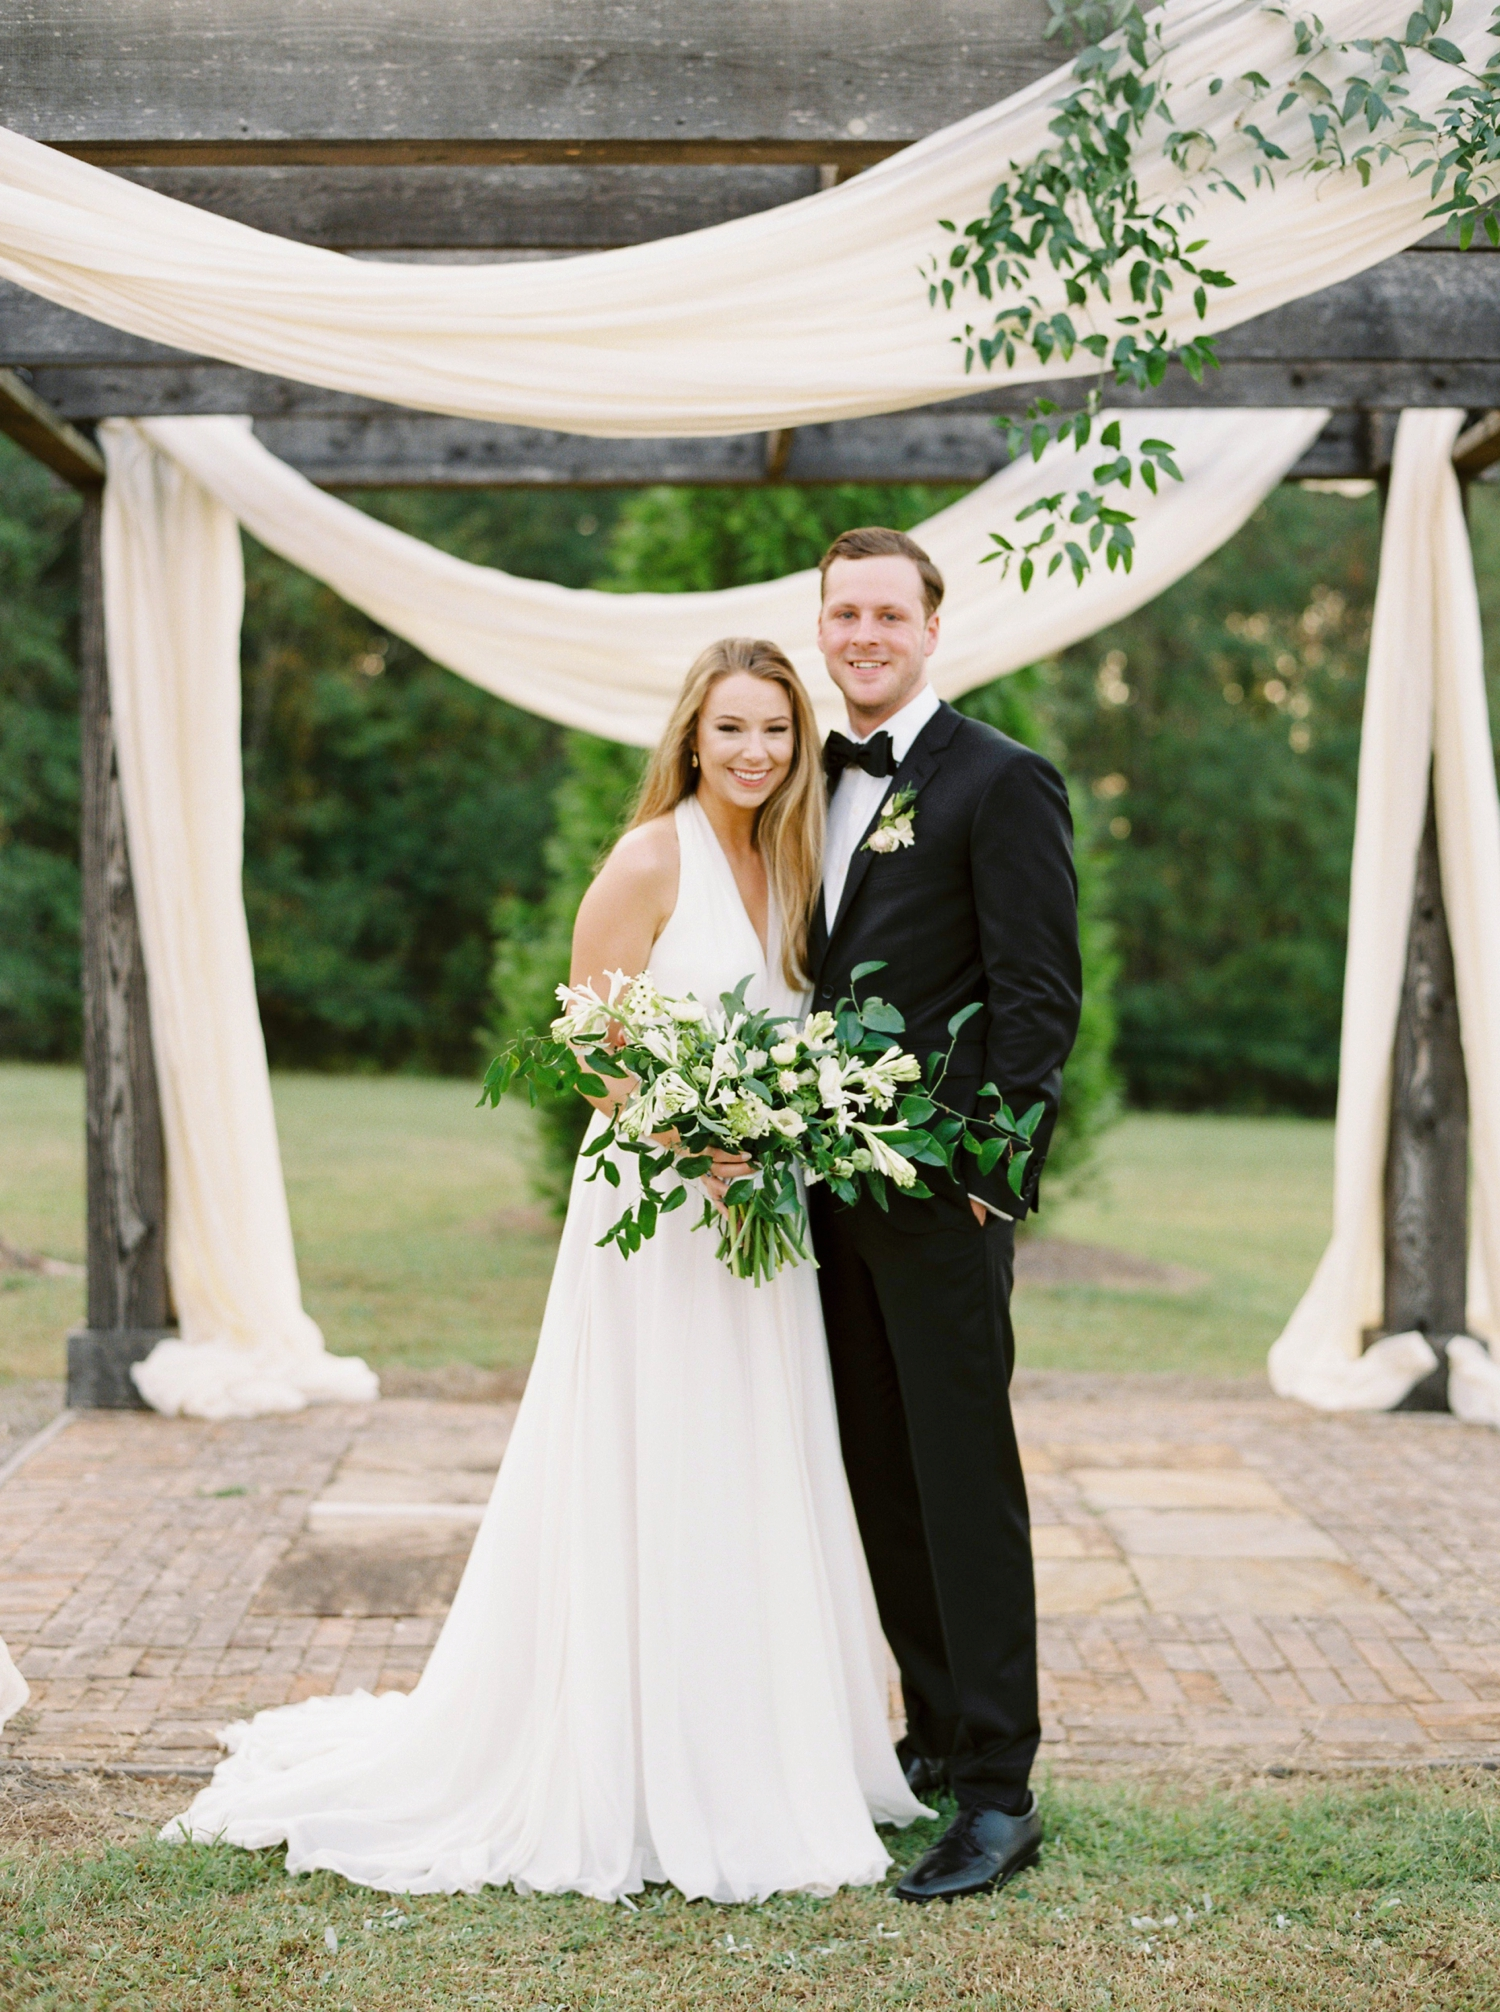 Calgary wedding photographers | georgia wedding photographers | fine art film | Justine Milton Photography | georgia wedding | wedding ceremony | just married | bride and groom portraits